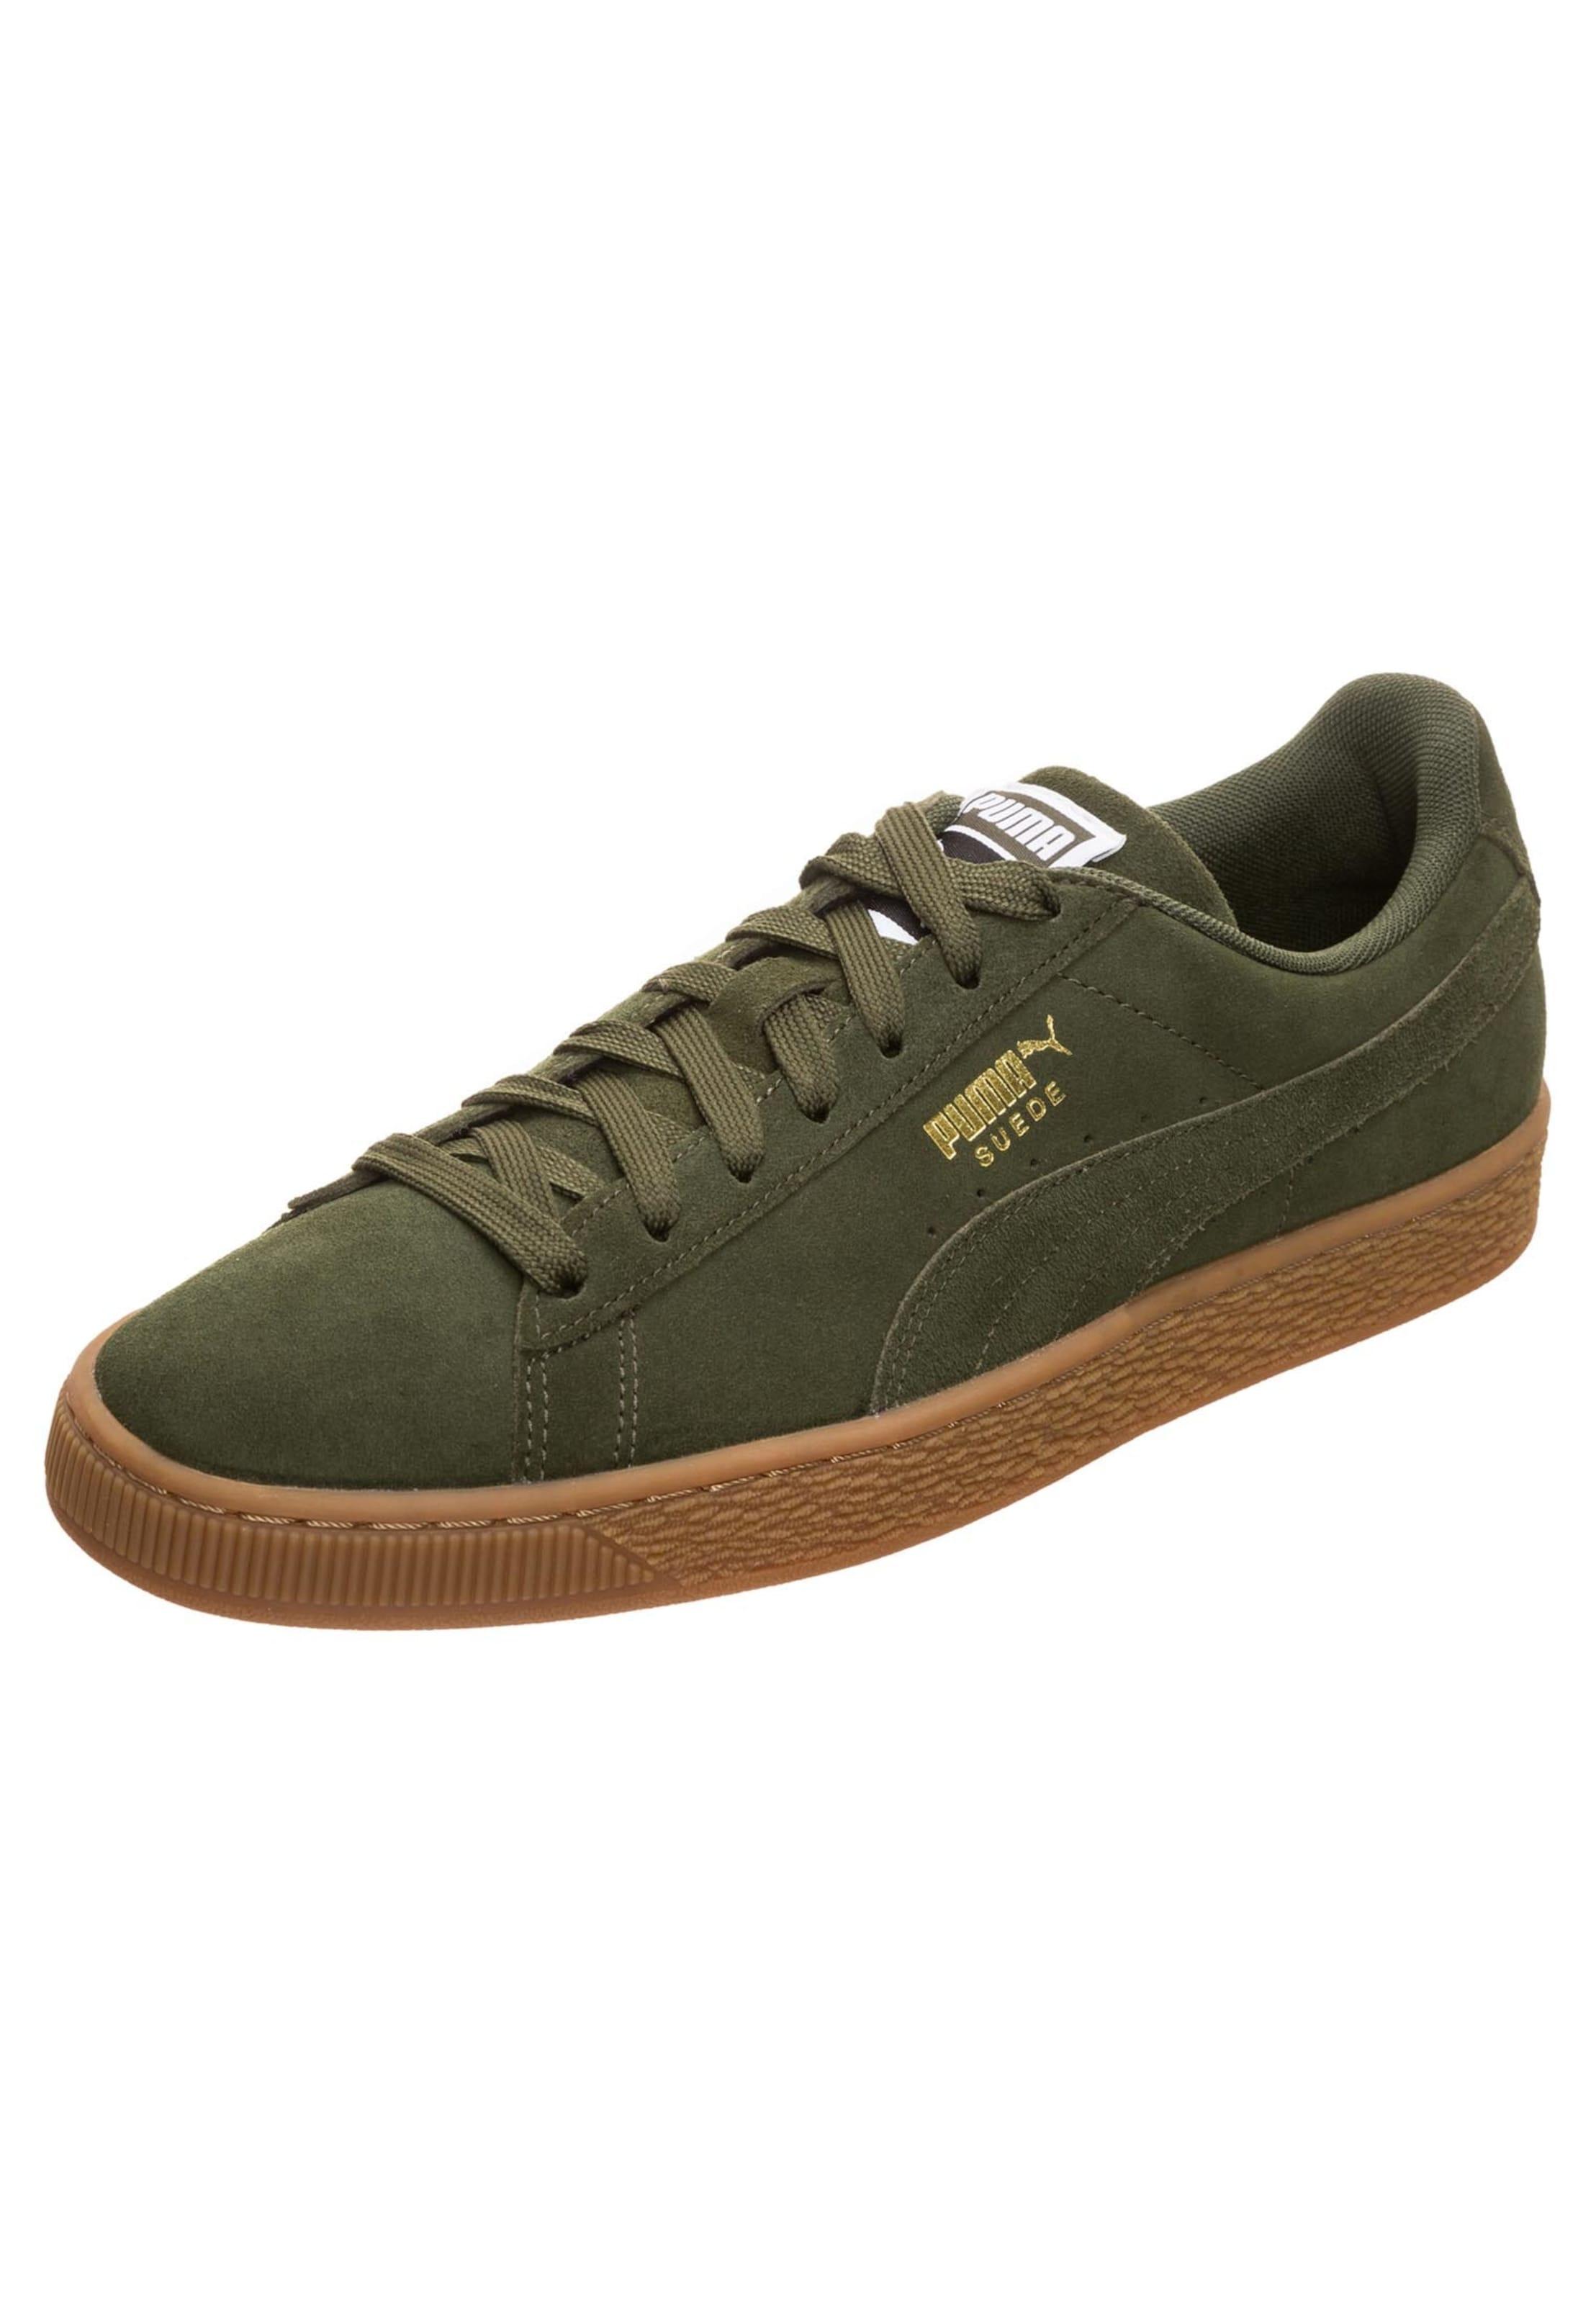 PUMA Suede Classic Sneaker Günstige und langlebige Schuhe